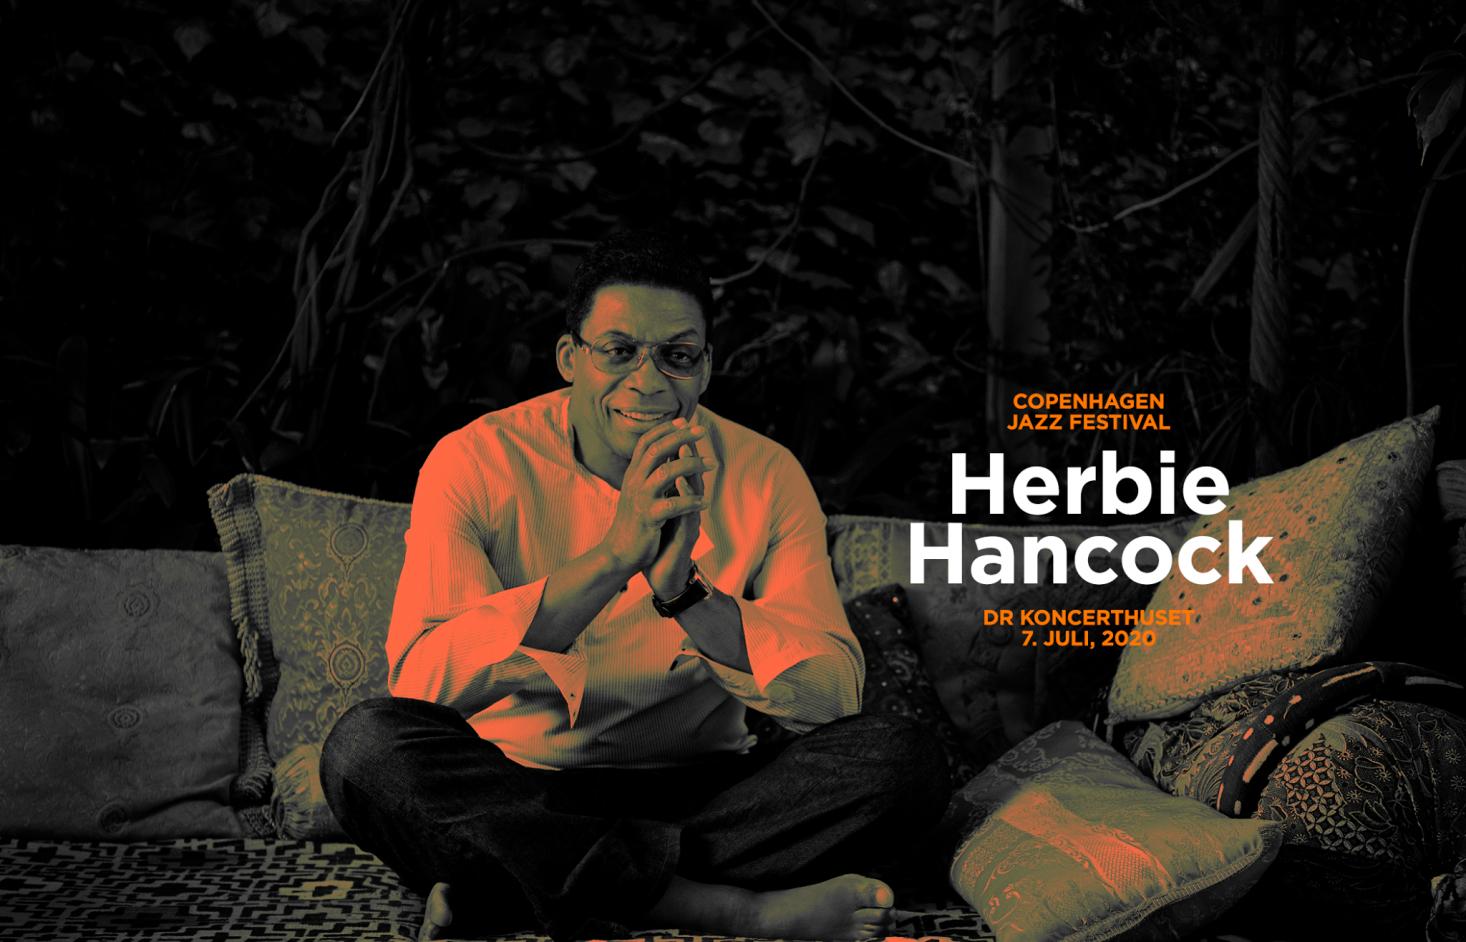 Herbie Hancock (US) og Bremer/McCoy er de første koncertsalsnavne på Copenhagen Jazz Festival 2020